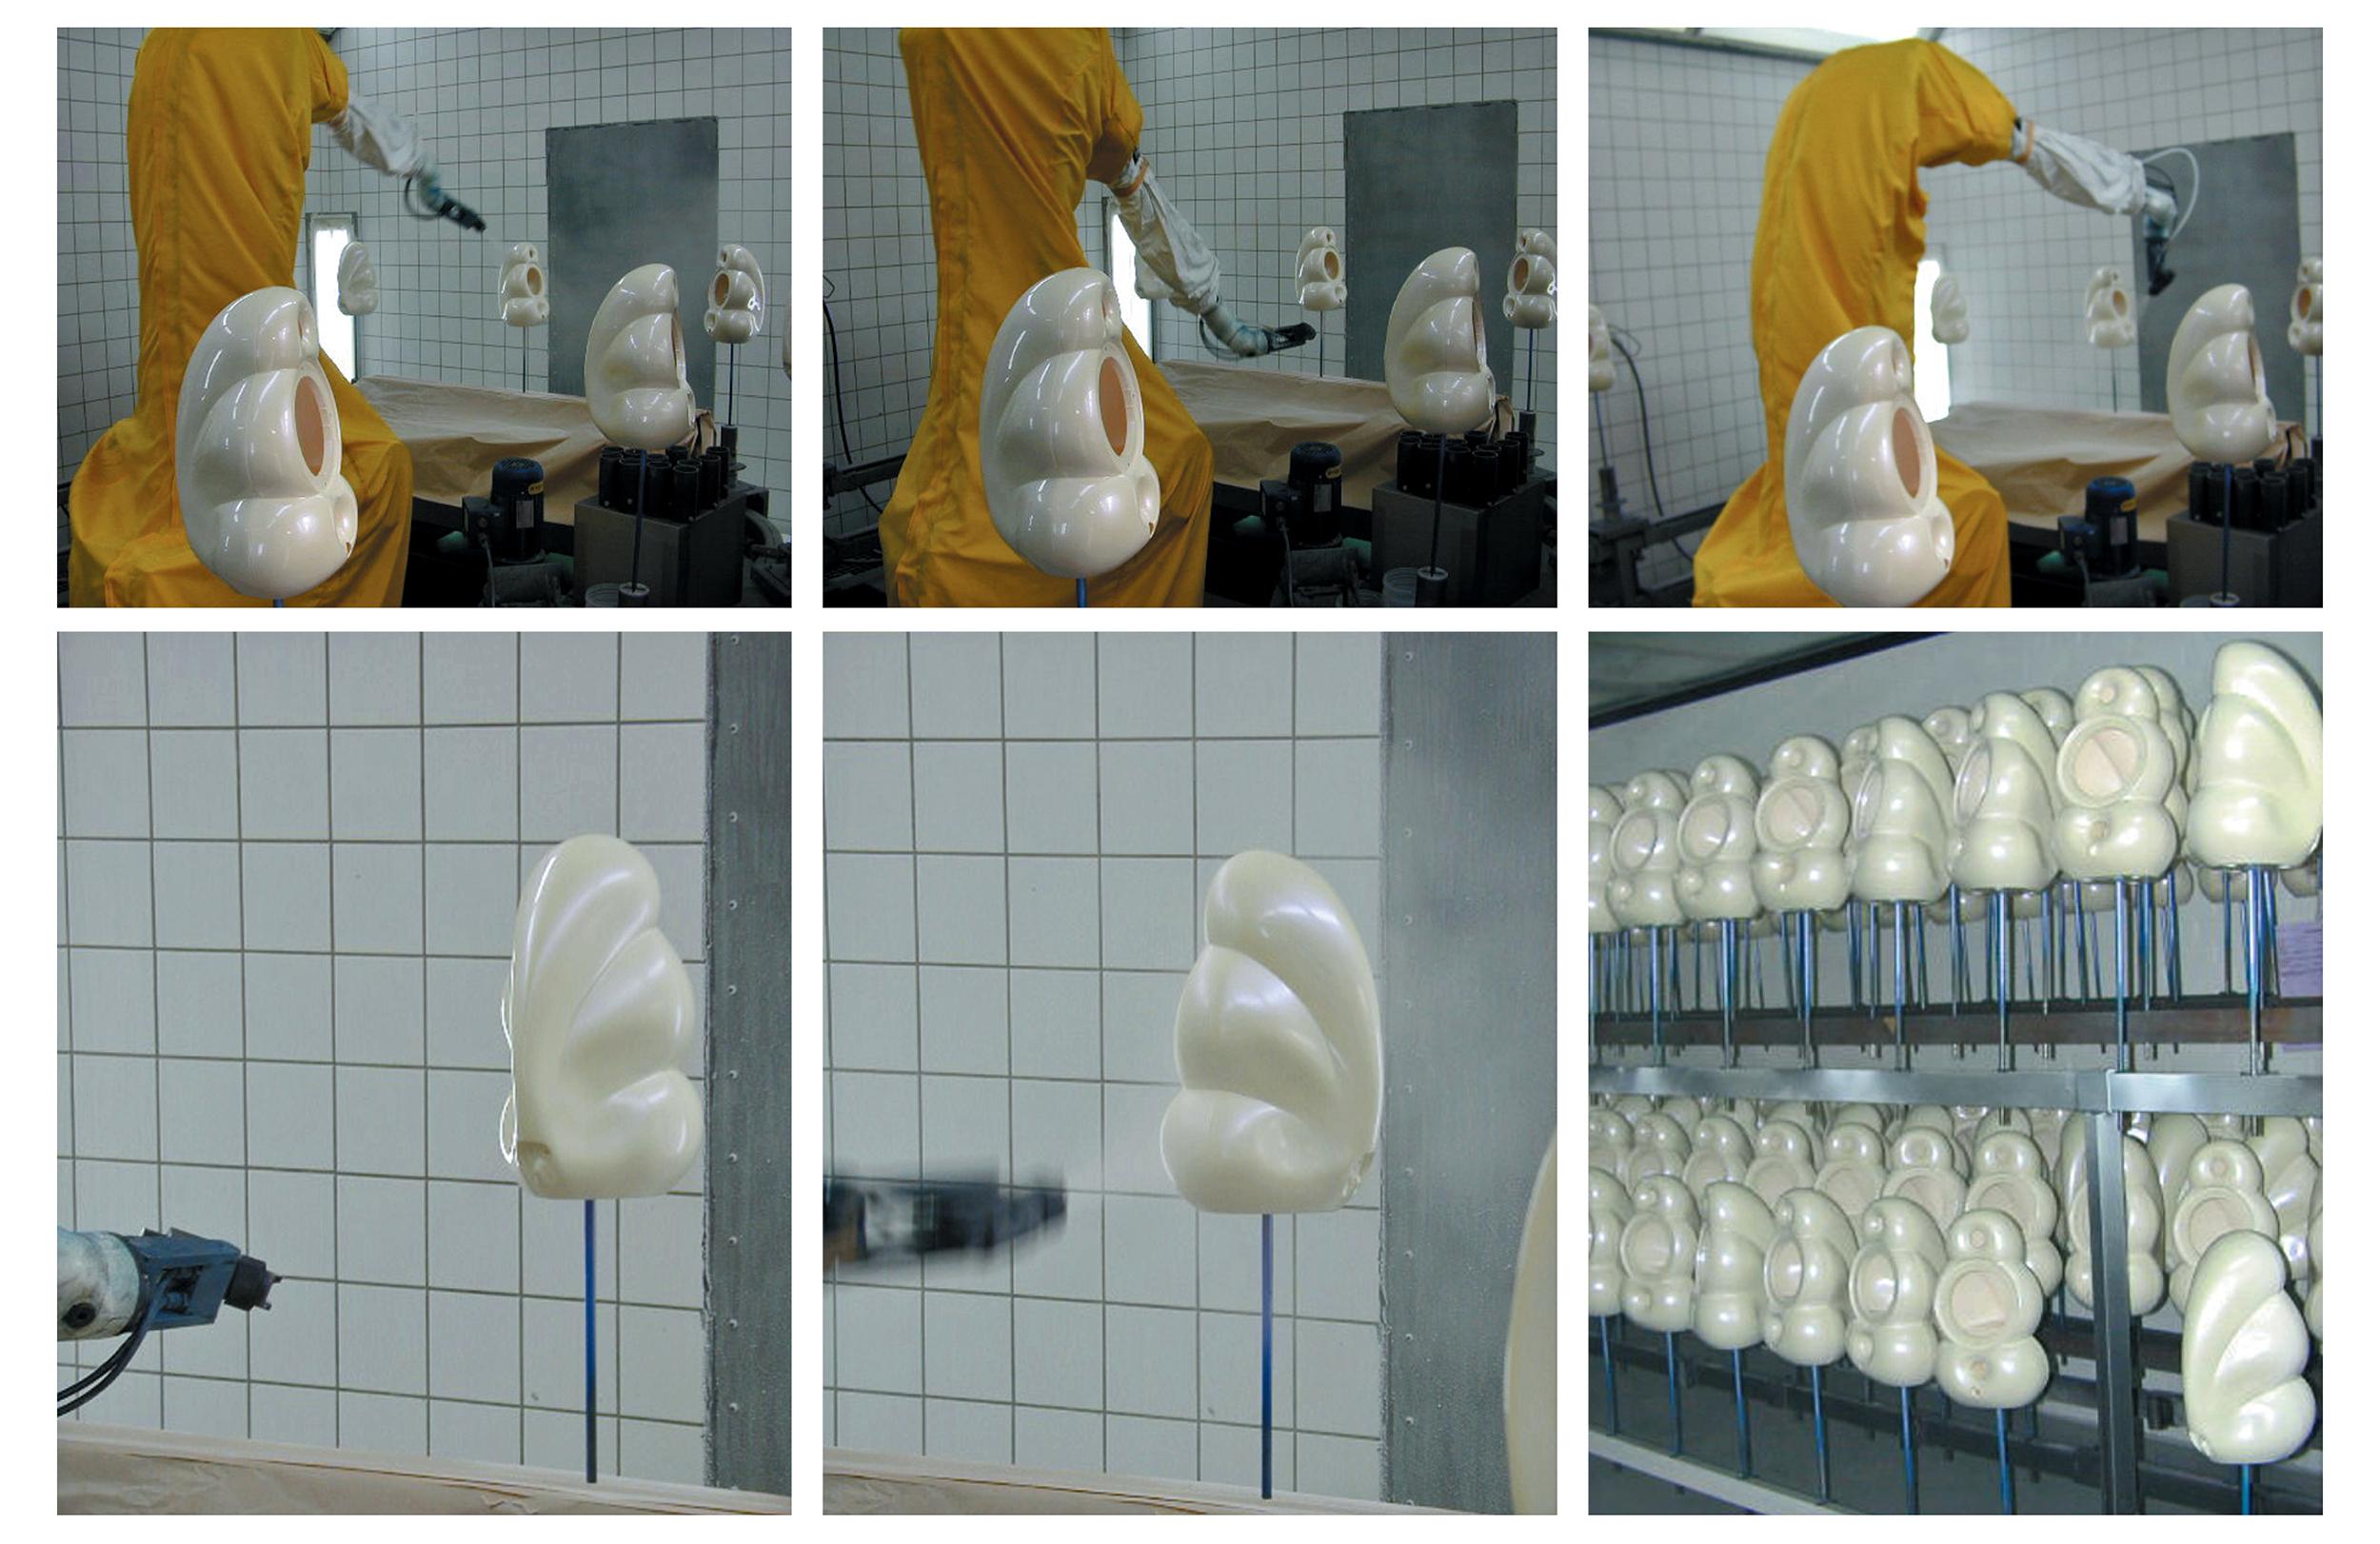 spraying-arm-01MAY17-SMALL.jpg